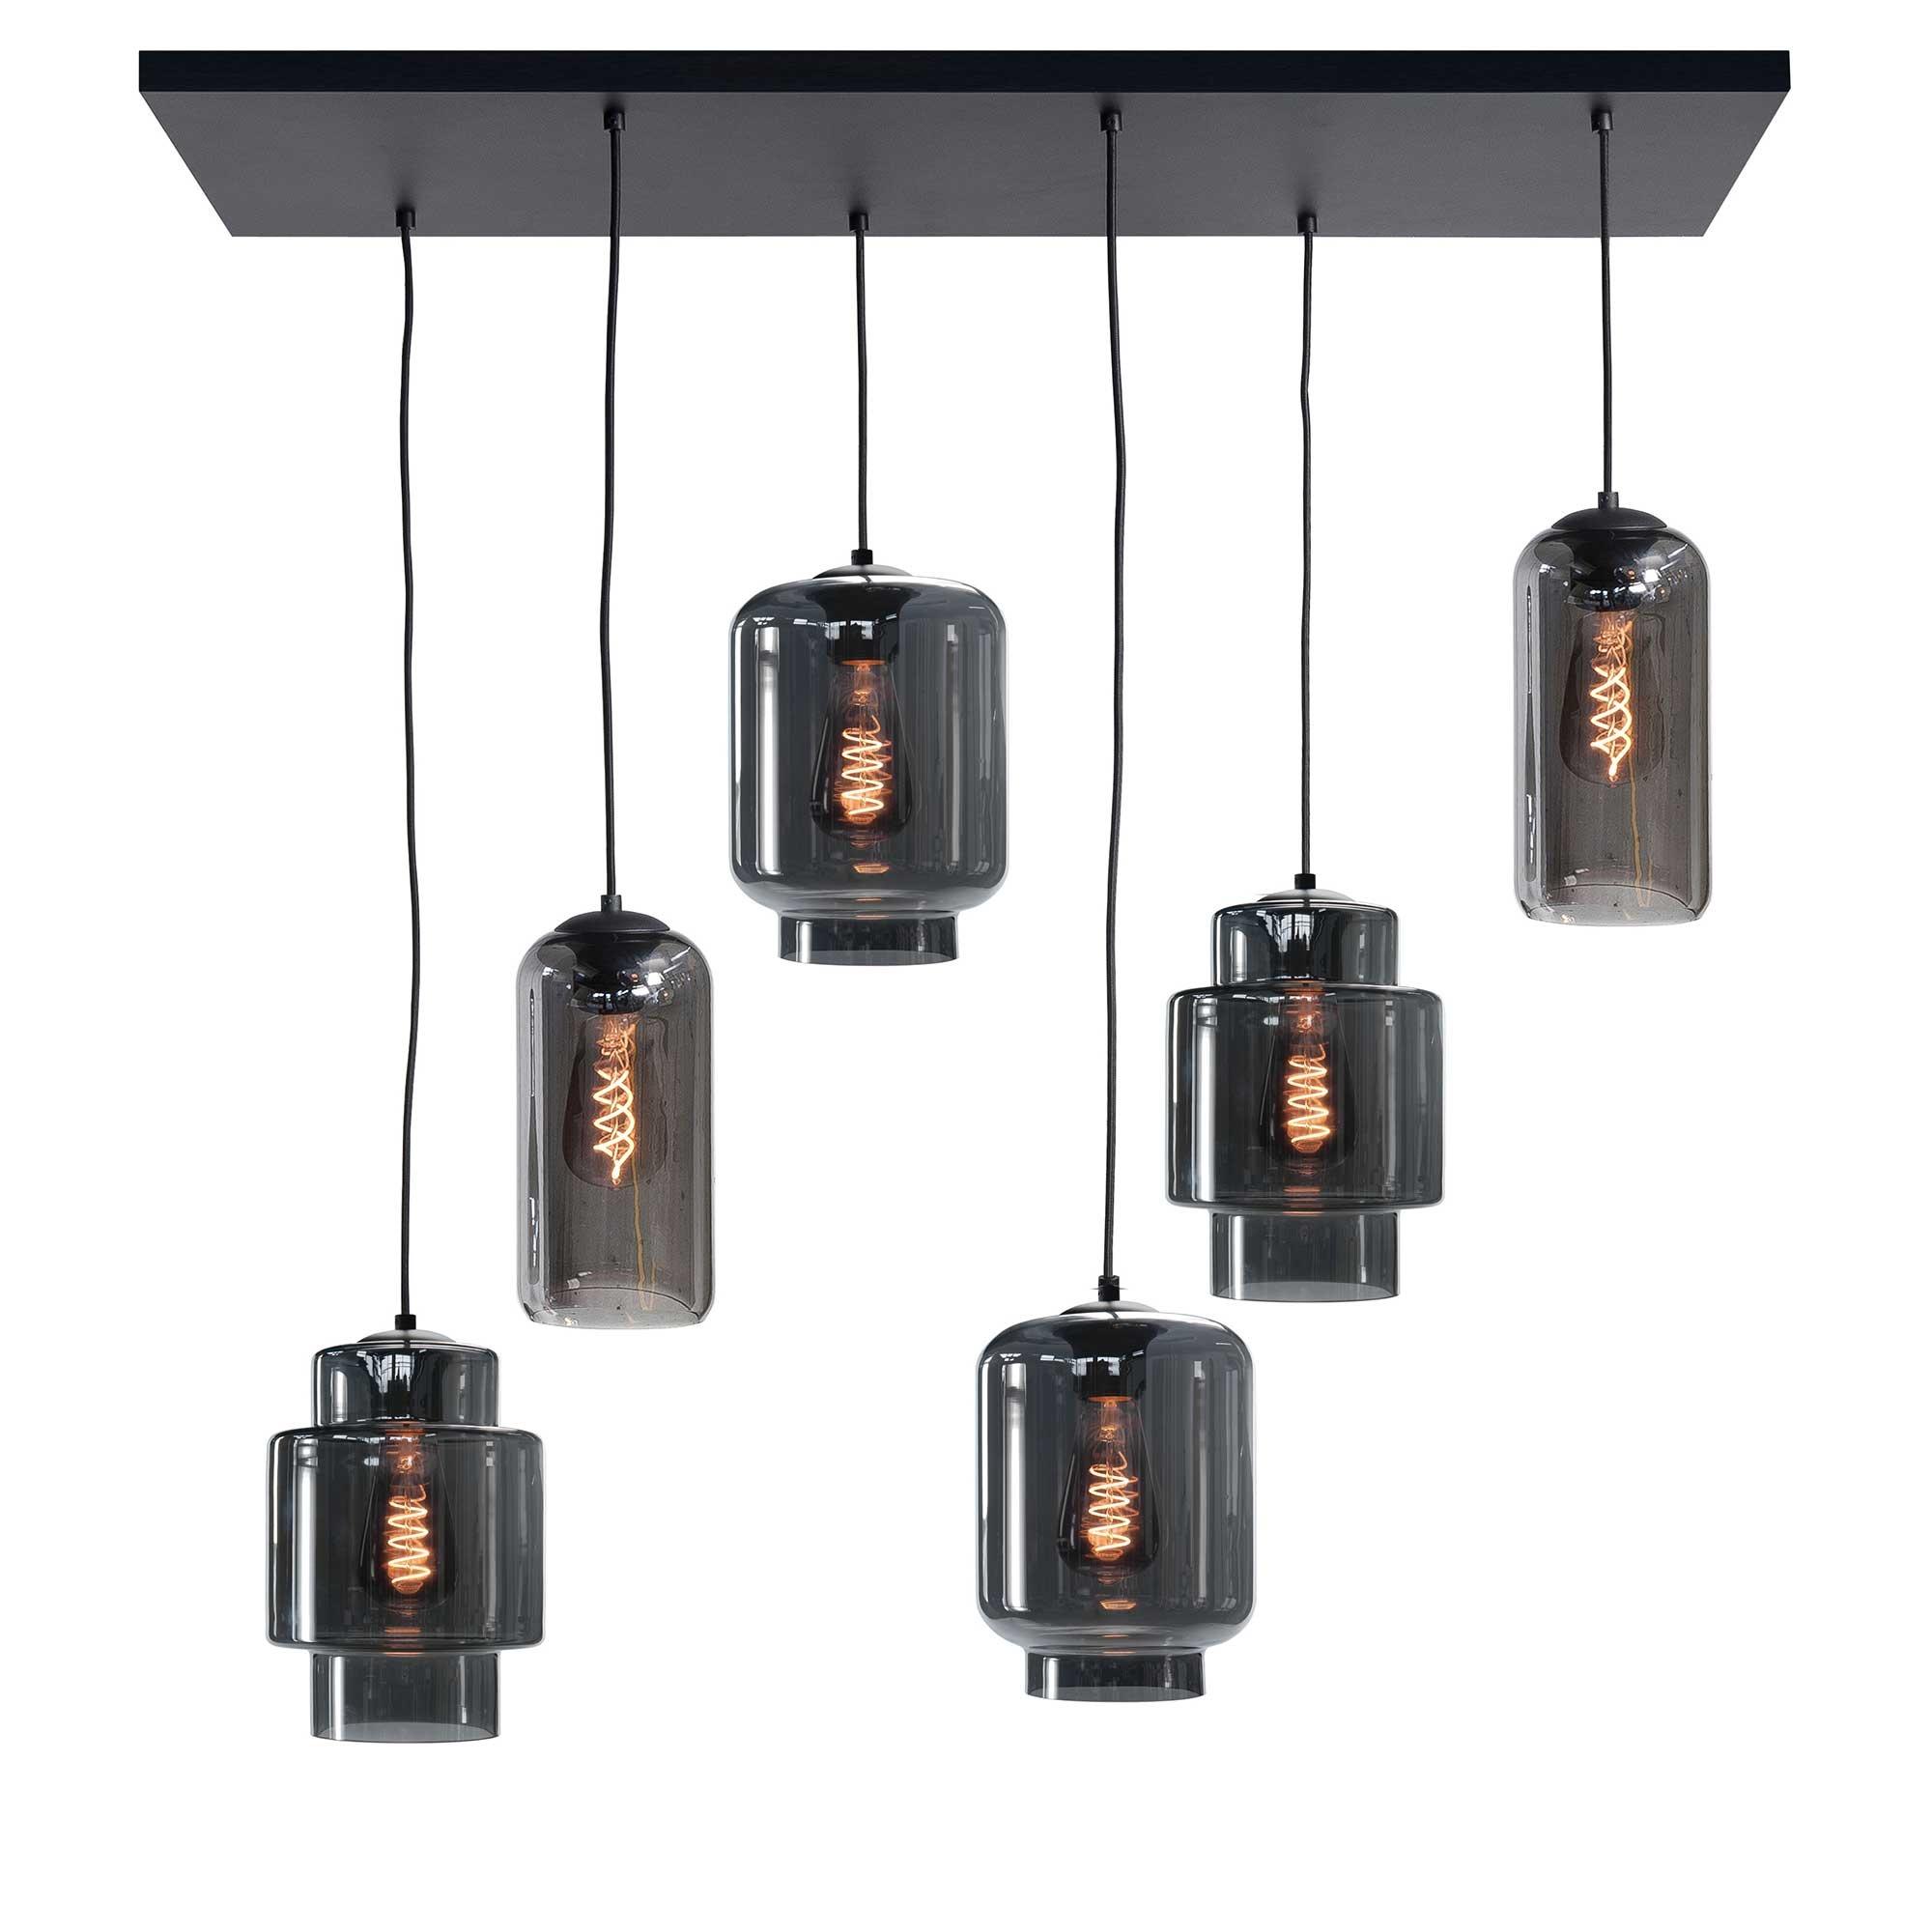 Highlight Hanglamp Fantasy Moderno 6 lichts L 100 x B 35 cm rook zwart